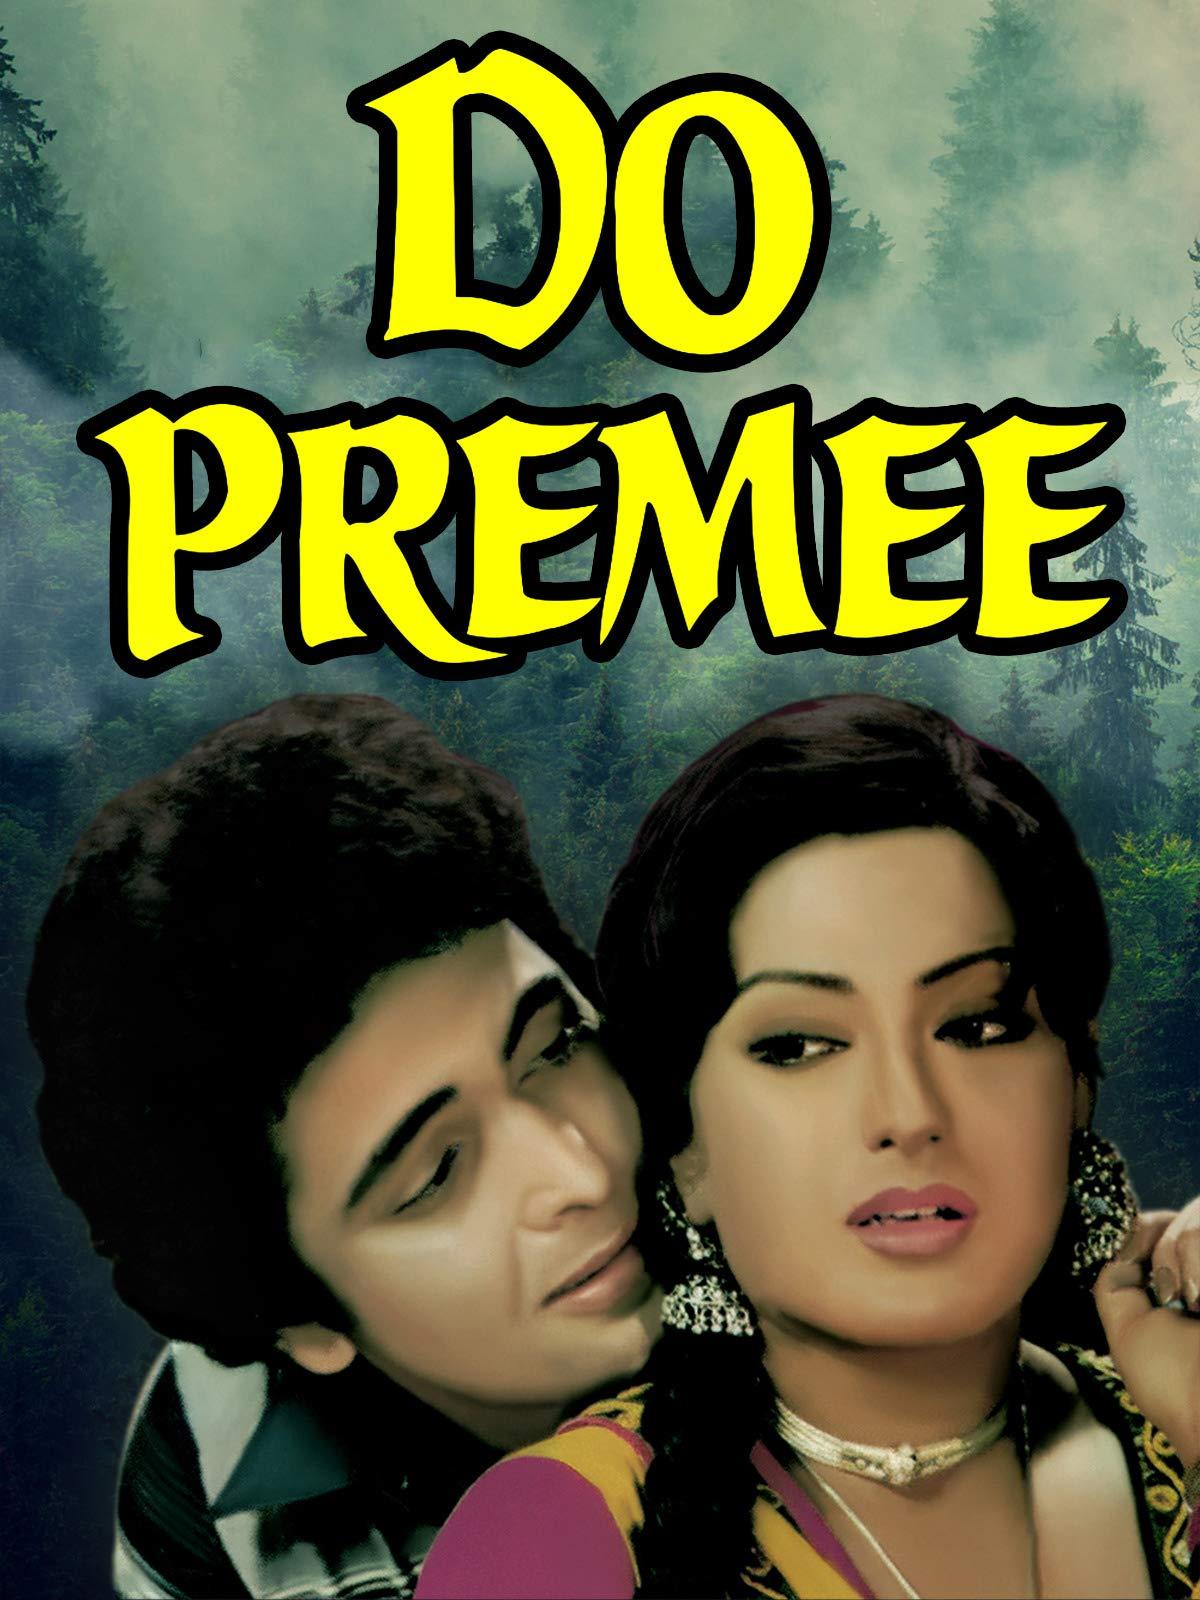 Do Premee (1980)